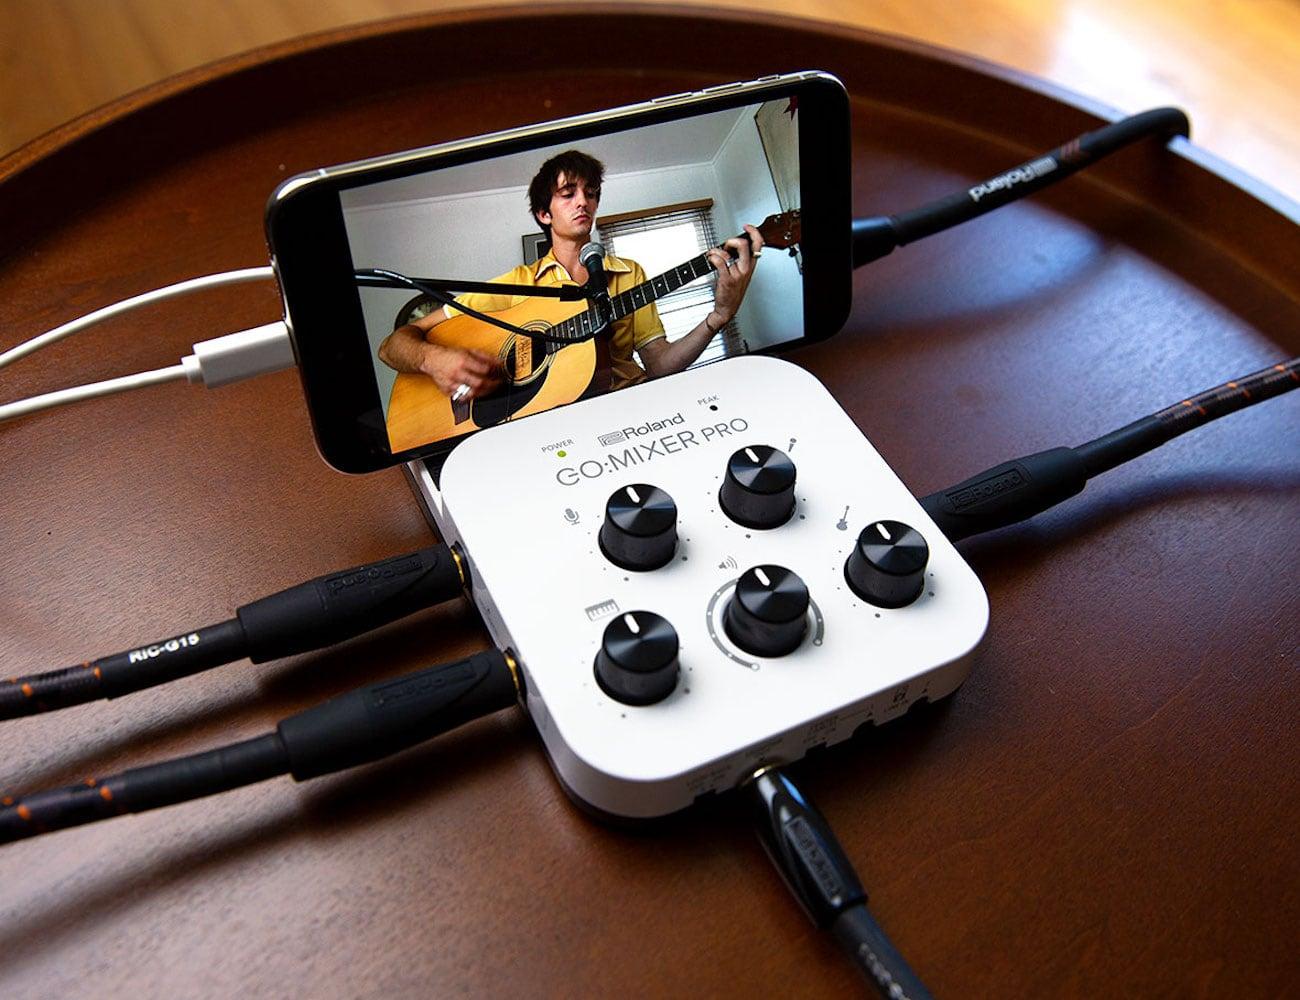 Roland GO:MIXER PRO Smartphone Audio Mixer